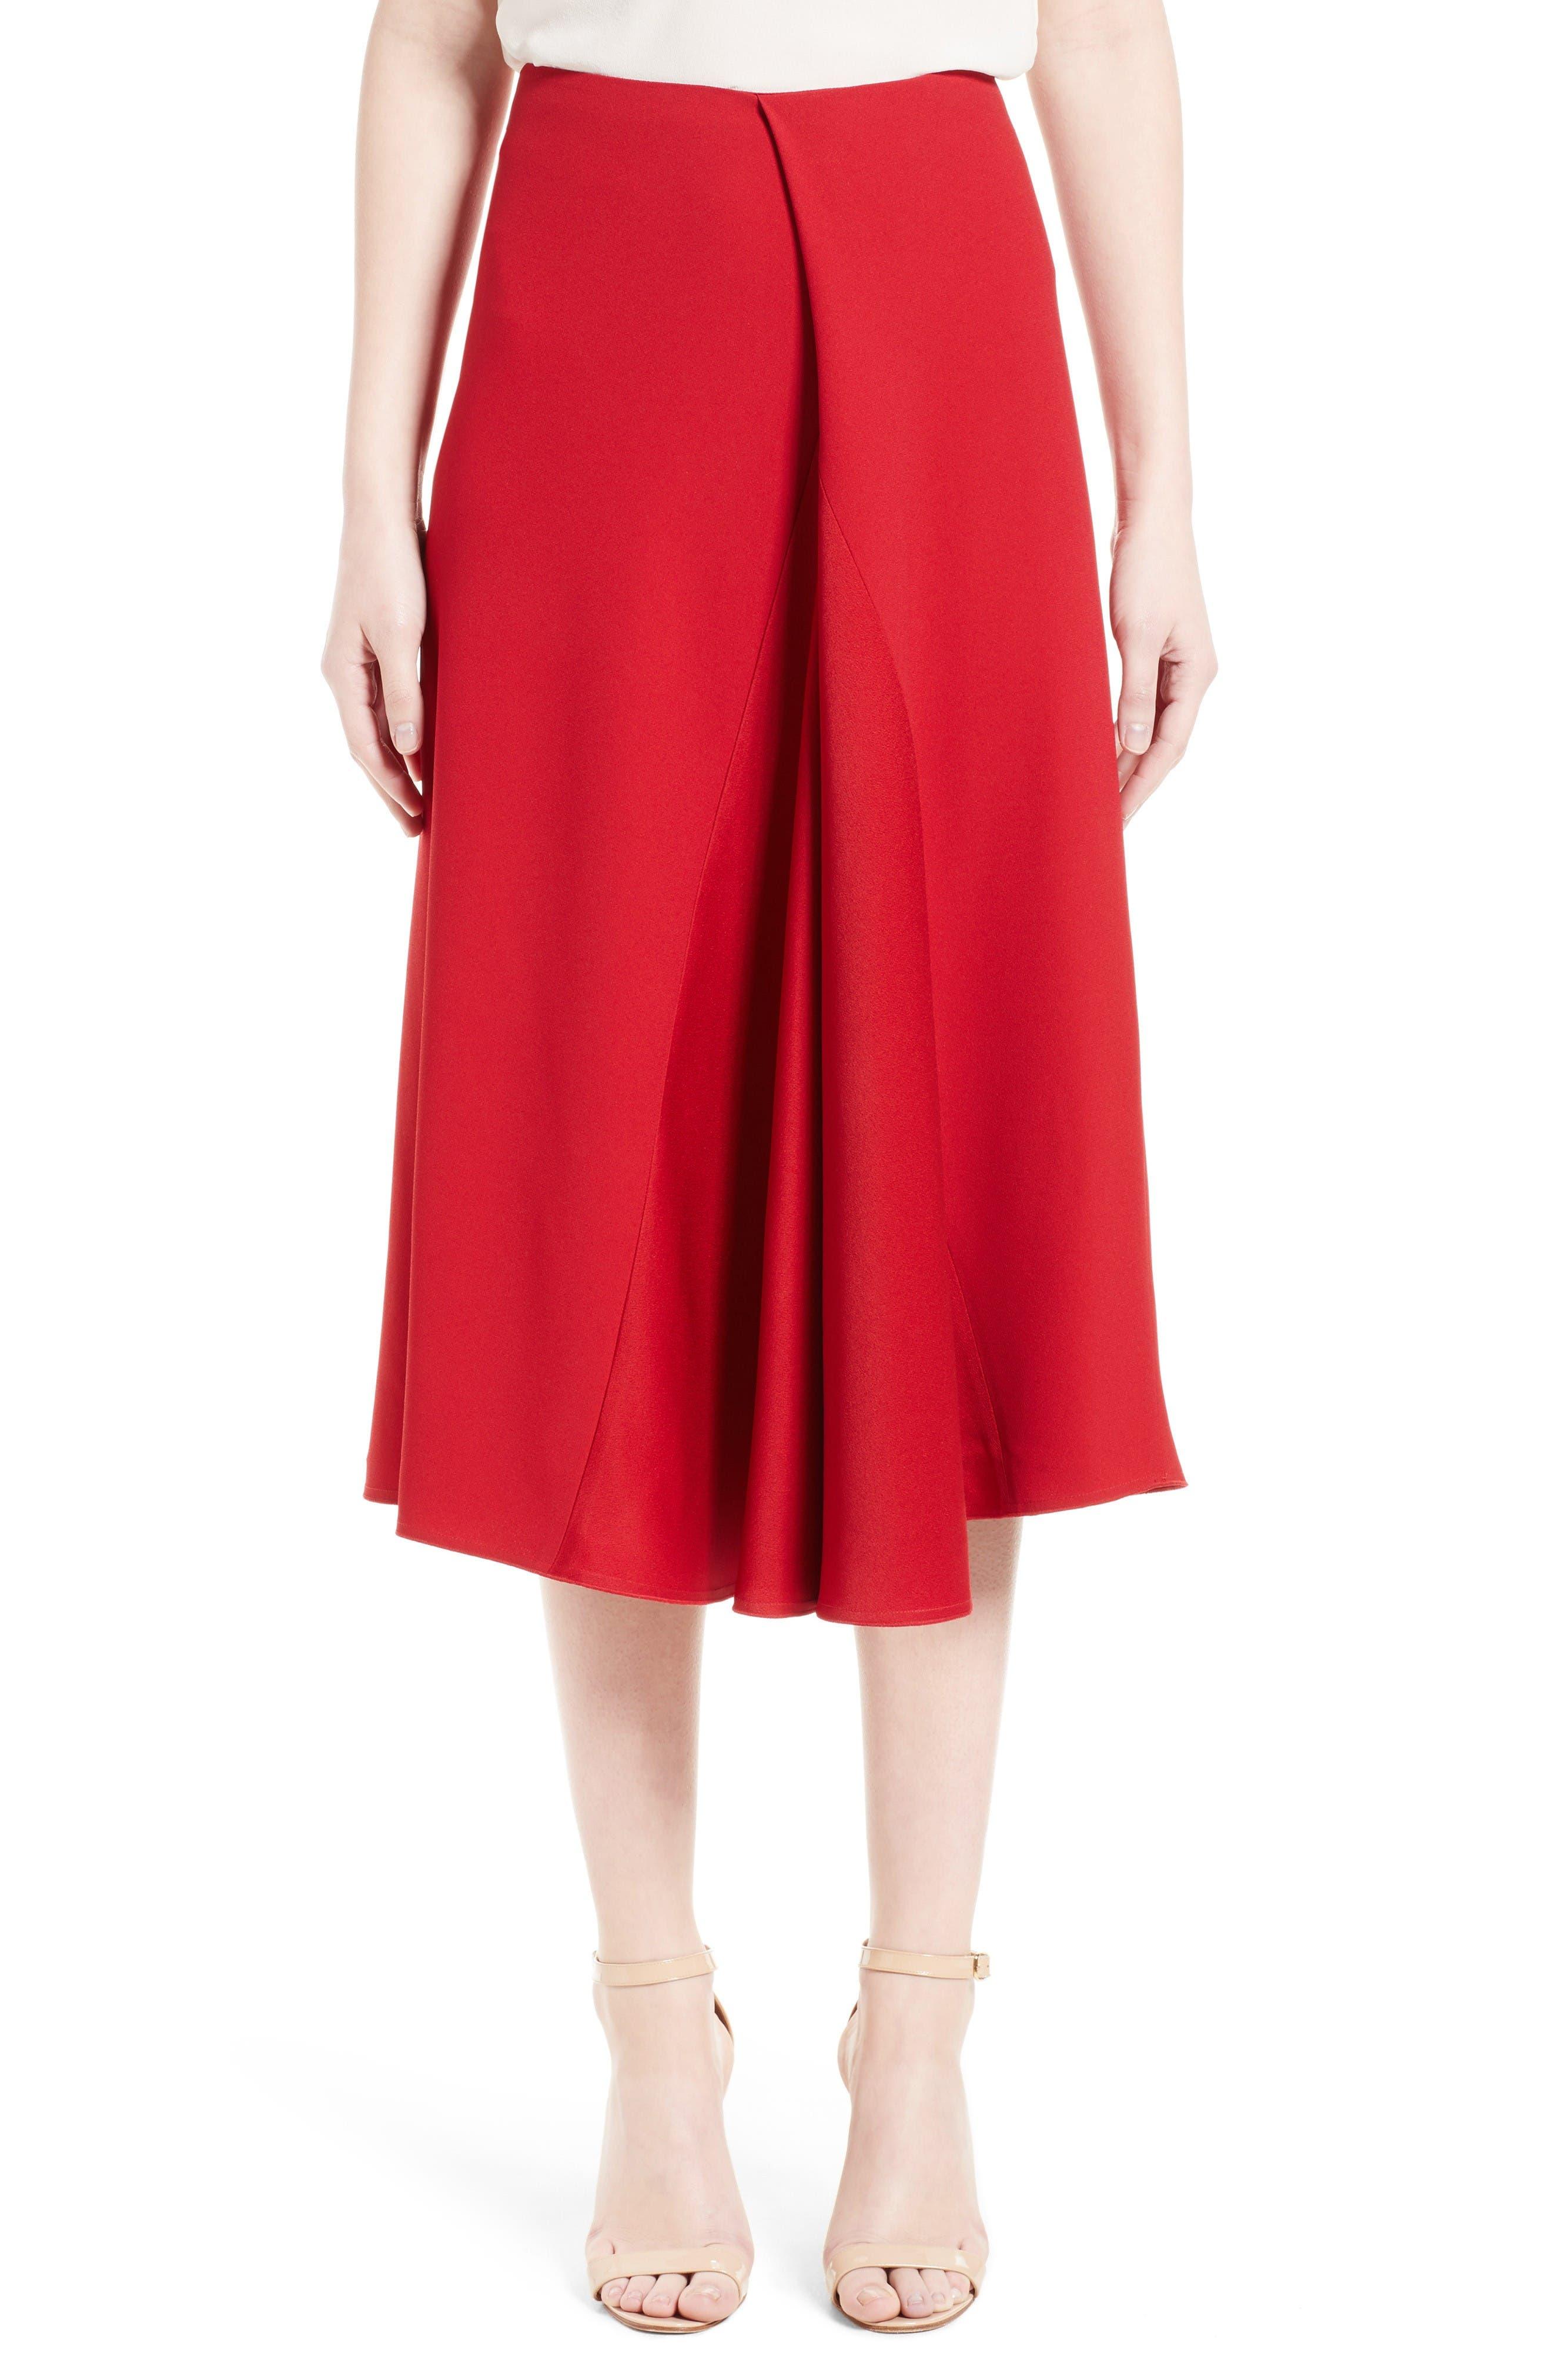 Main Image - Victoria Beckham Satin Crepe Godet Skirt